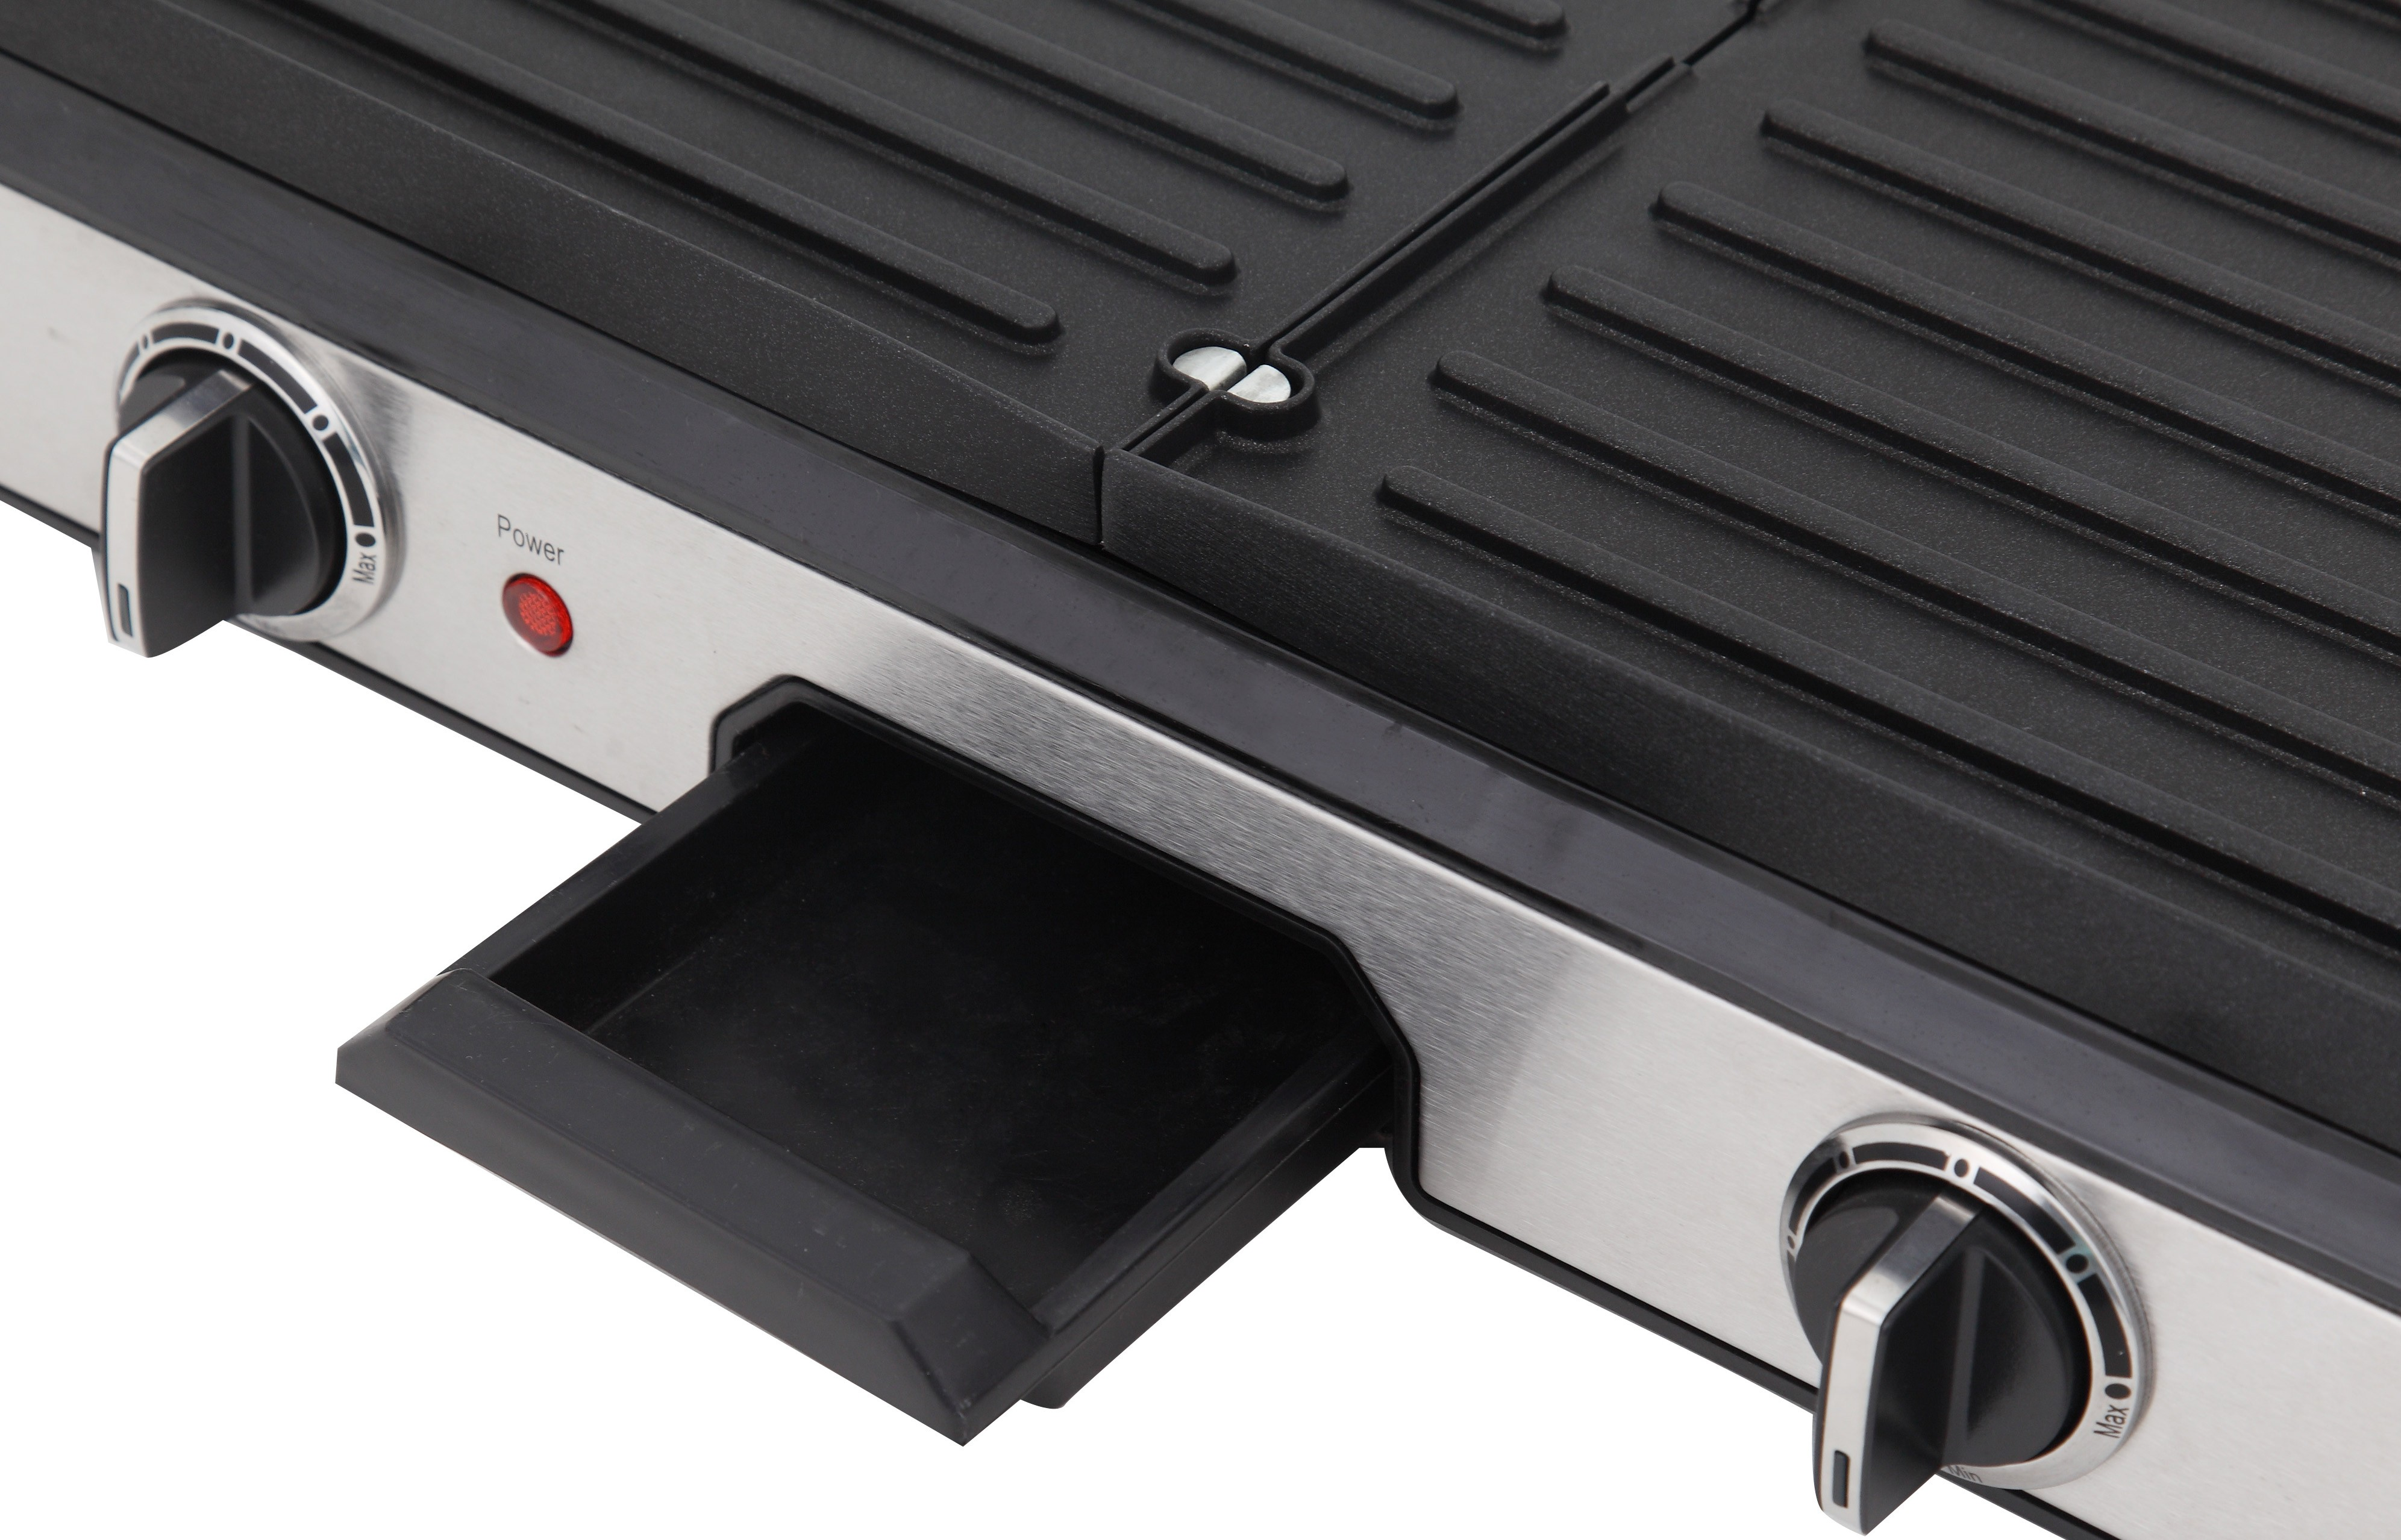 Tepro elektrogrill tischgrill arvada grillflache 50x25cm for Elektrogrill gro e grillfl che